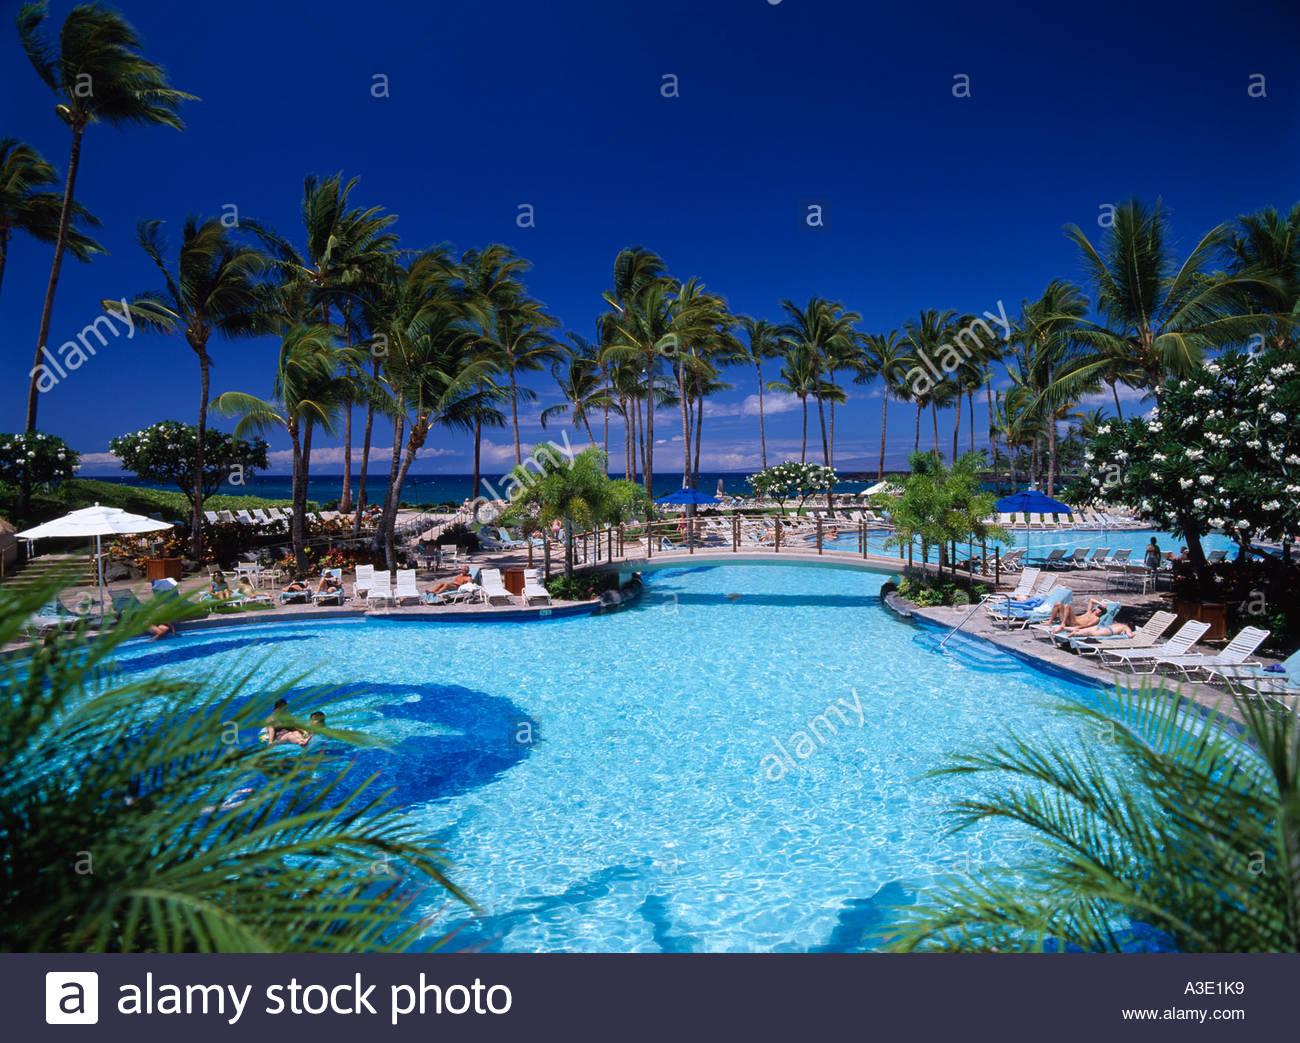 Hilton waikoloa village swimming pool hawaii island hawaii - Hilton swimming pool ...